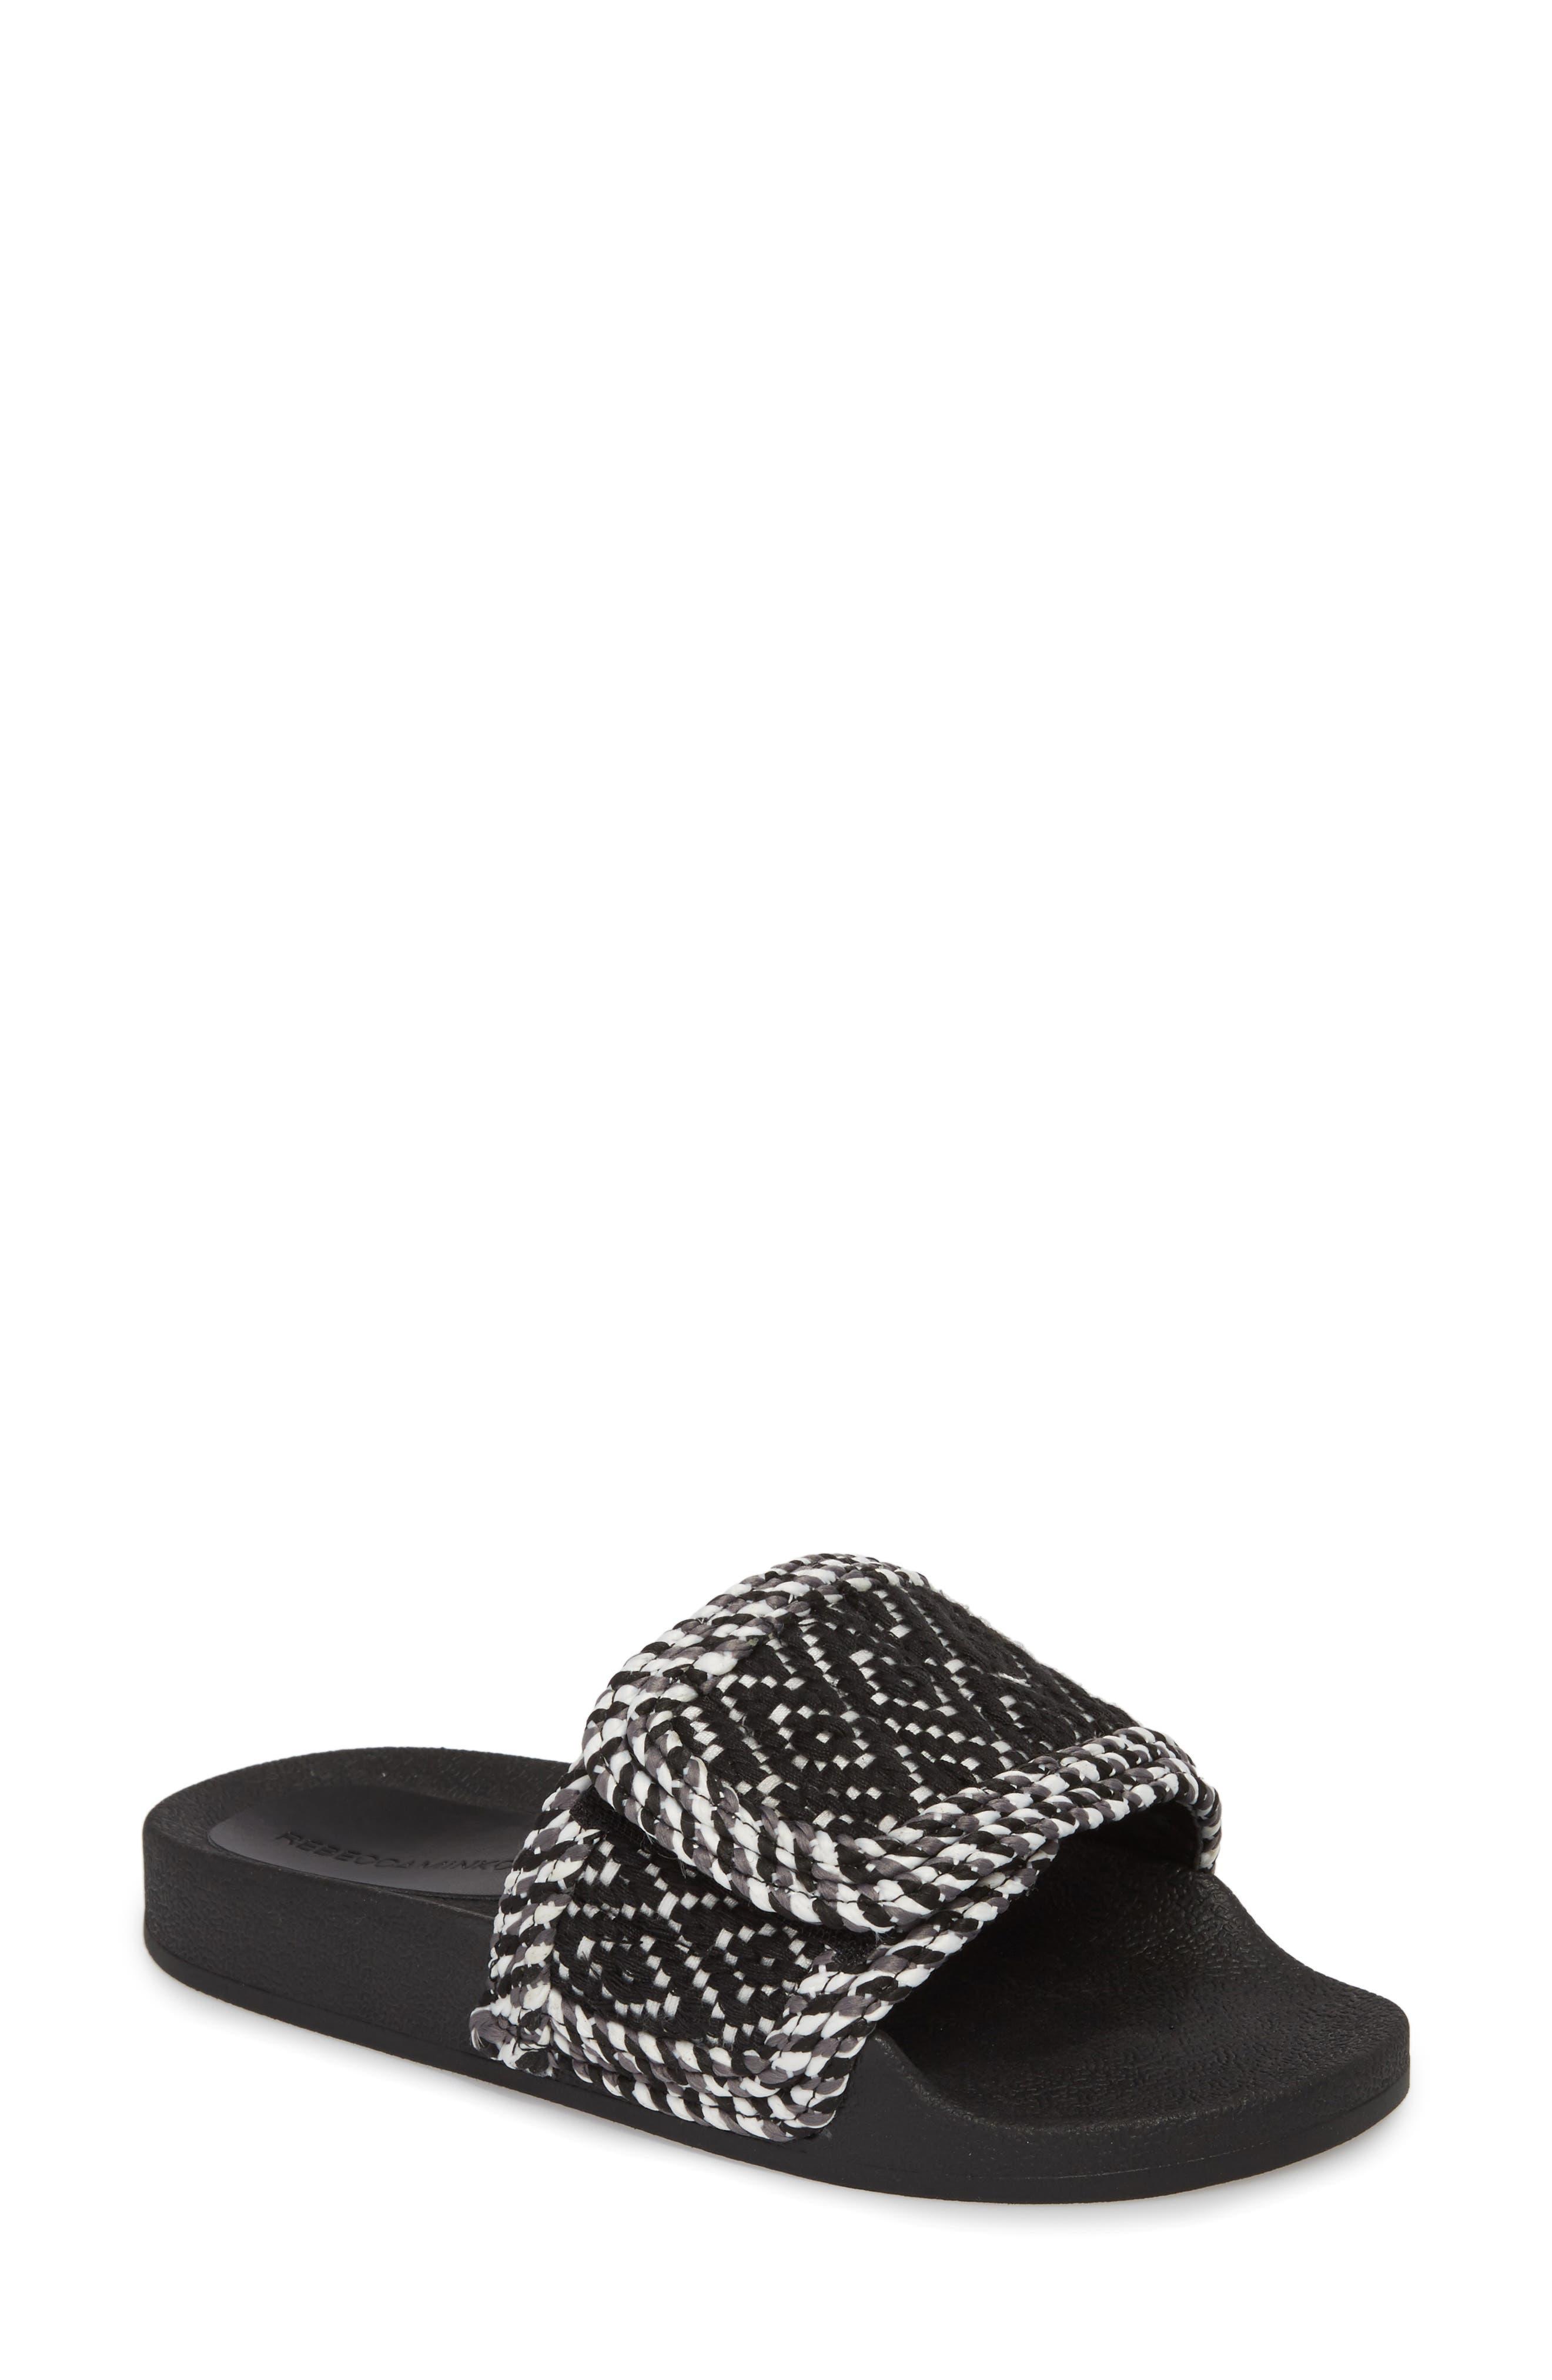 Tressa Woven Slide Sandal,                         Main,                         color, Black/ White Woven Fabric